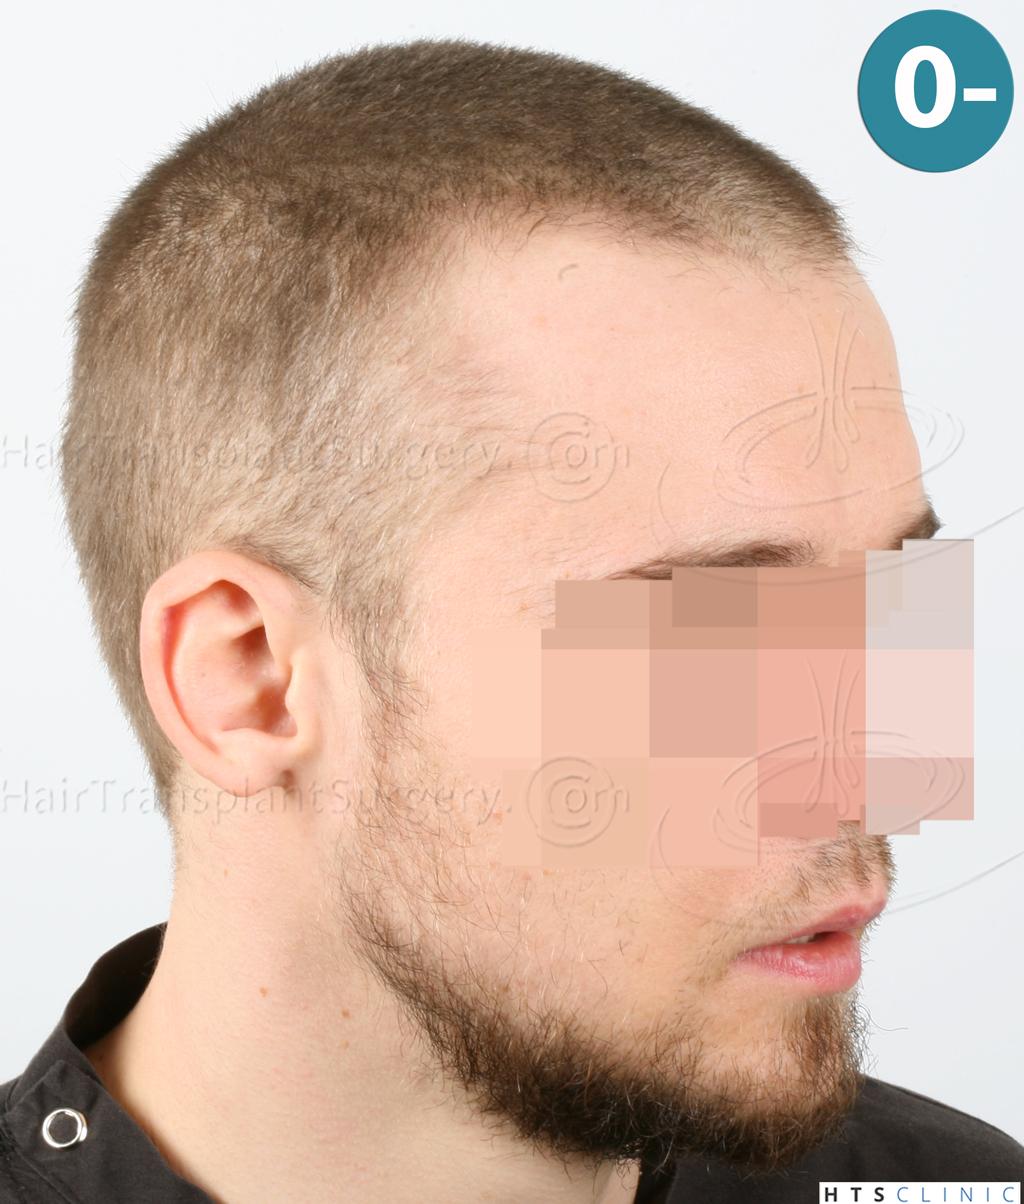 Dr.Devroye-HTS-Clinic-6132-_2011_1232_2889_-FUE-Barbe-et-cheveux-6.jpg